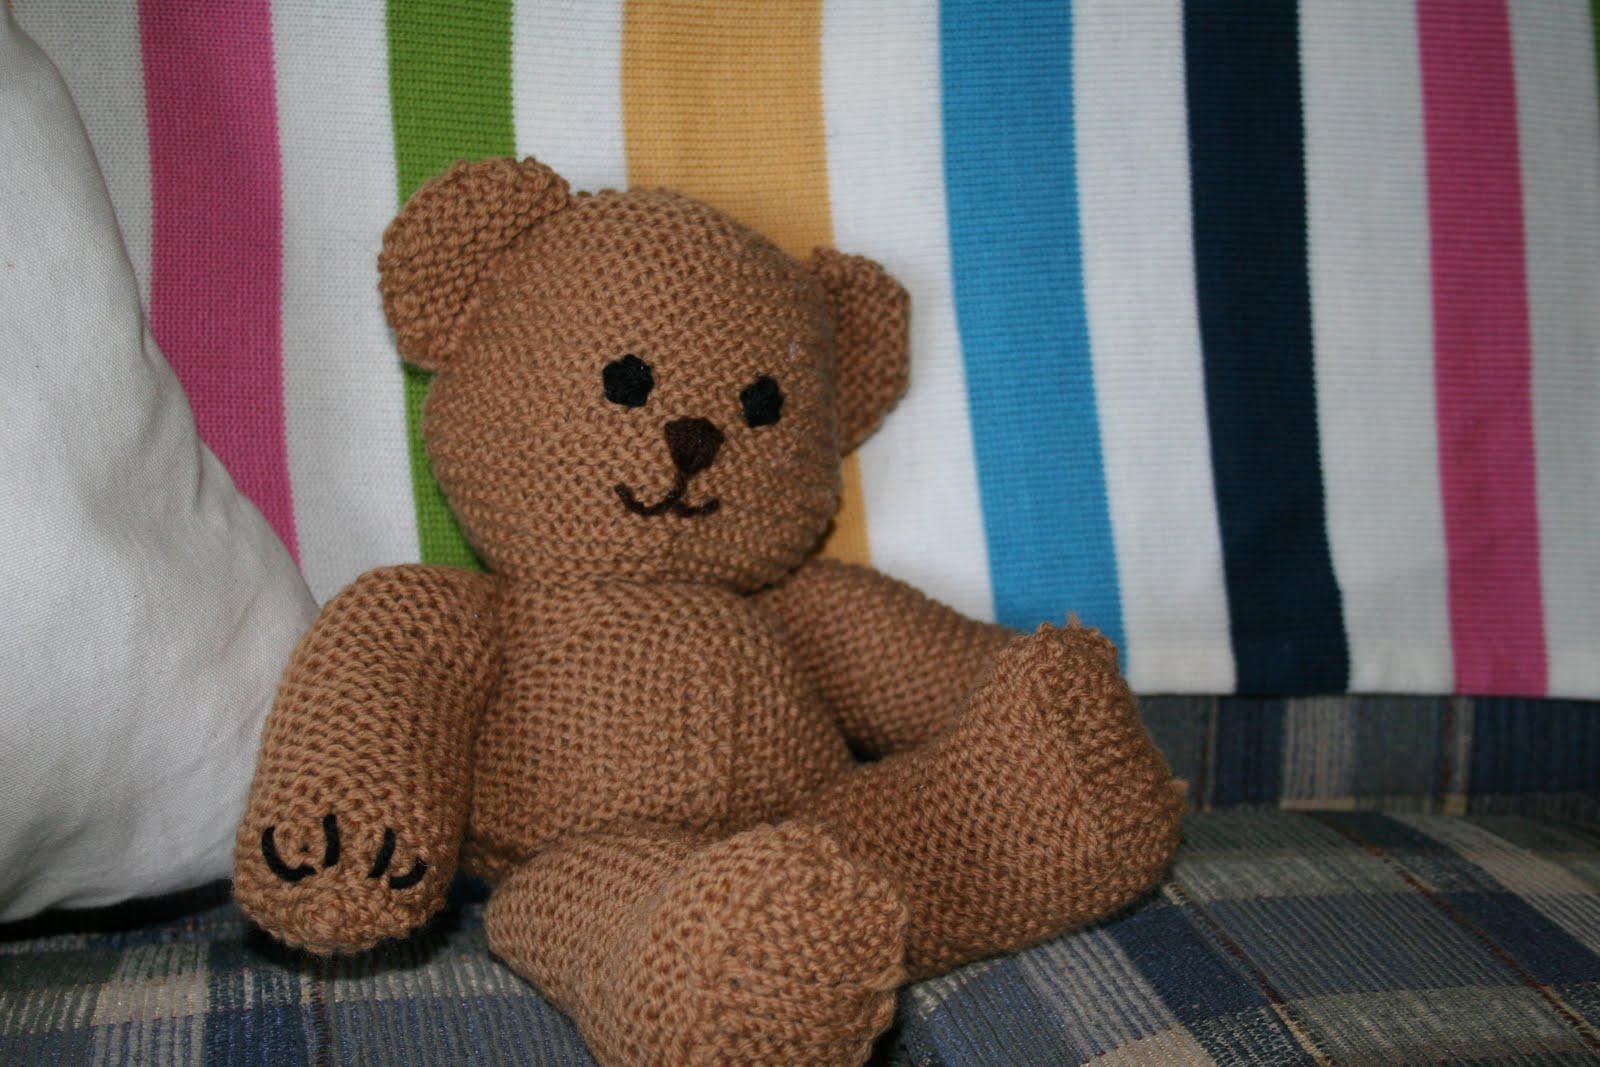 joyful strength: knit teddy bear